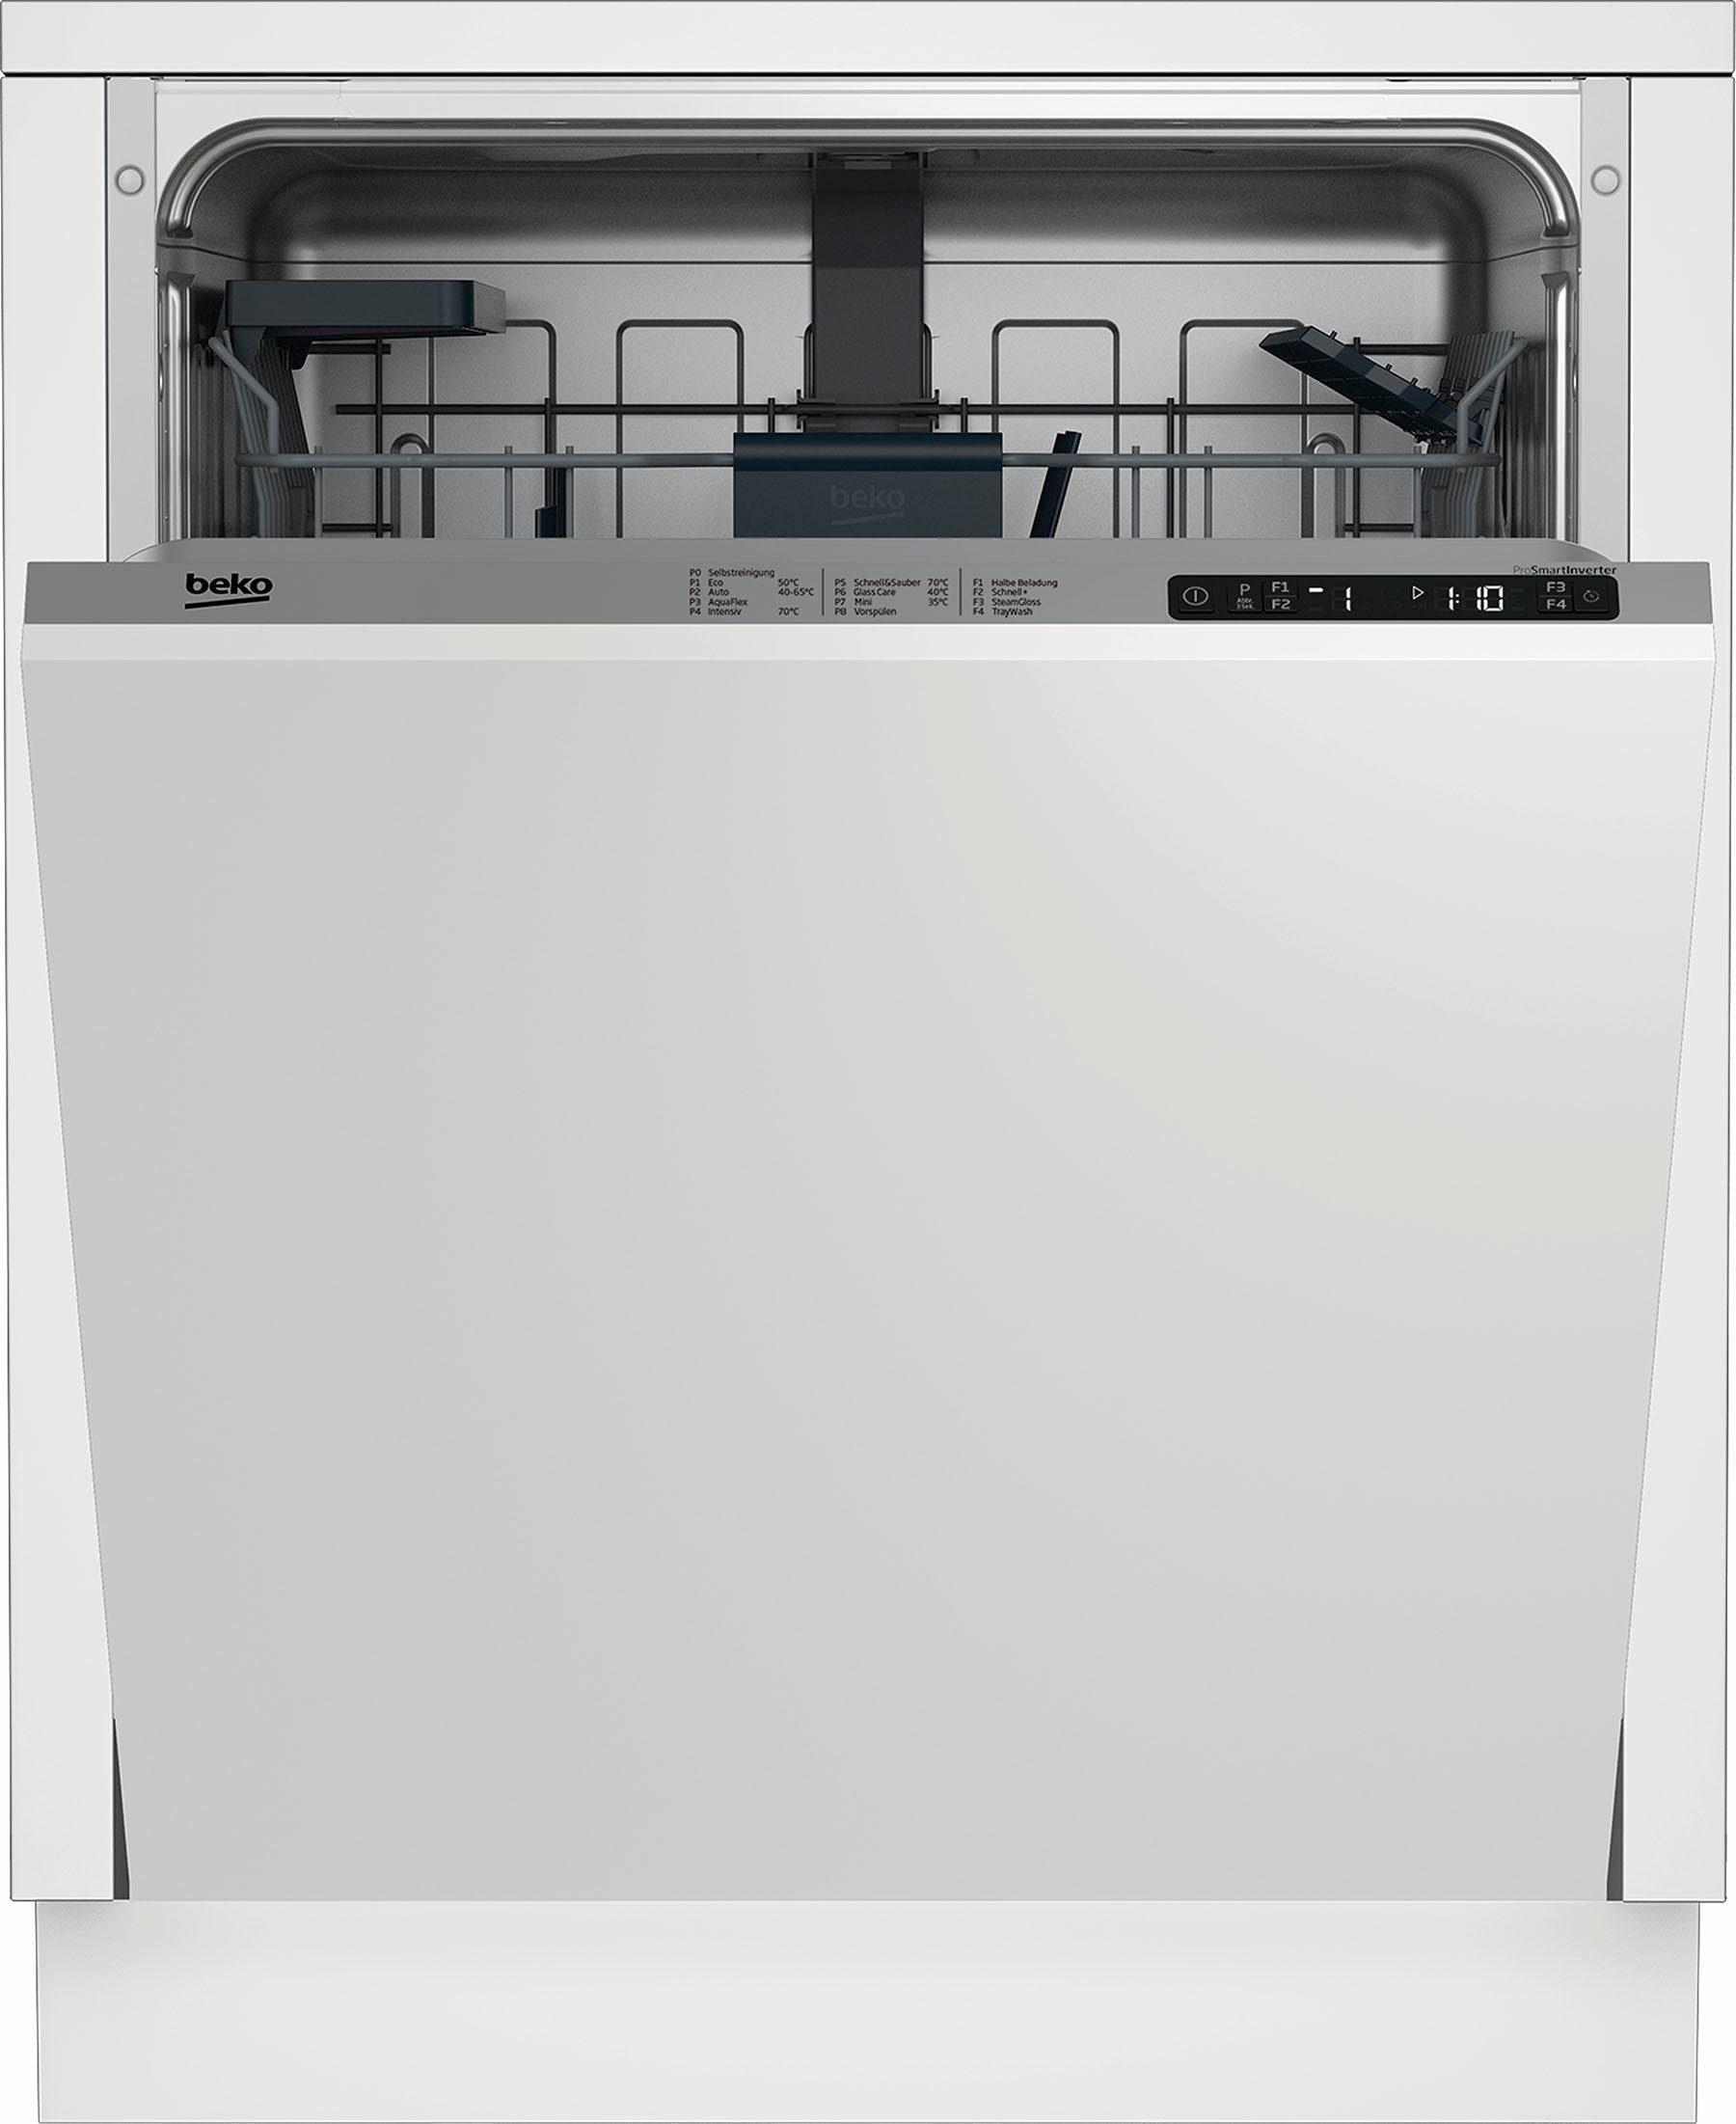 BEKO vollintegrierbarer Geschirrspüler, DIN28O35, 9,5 l, 14 Maßgedecke